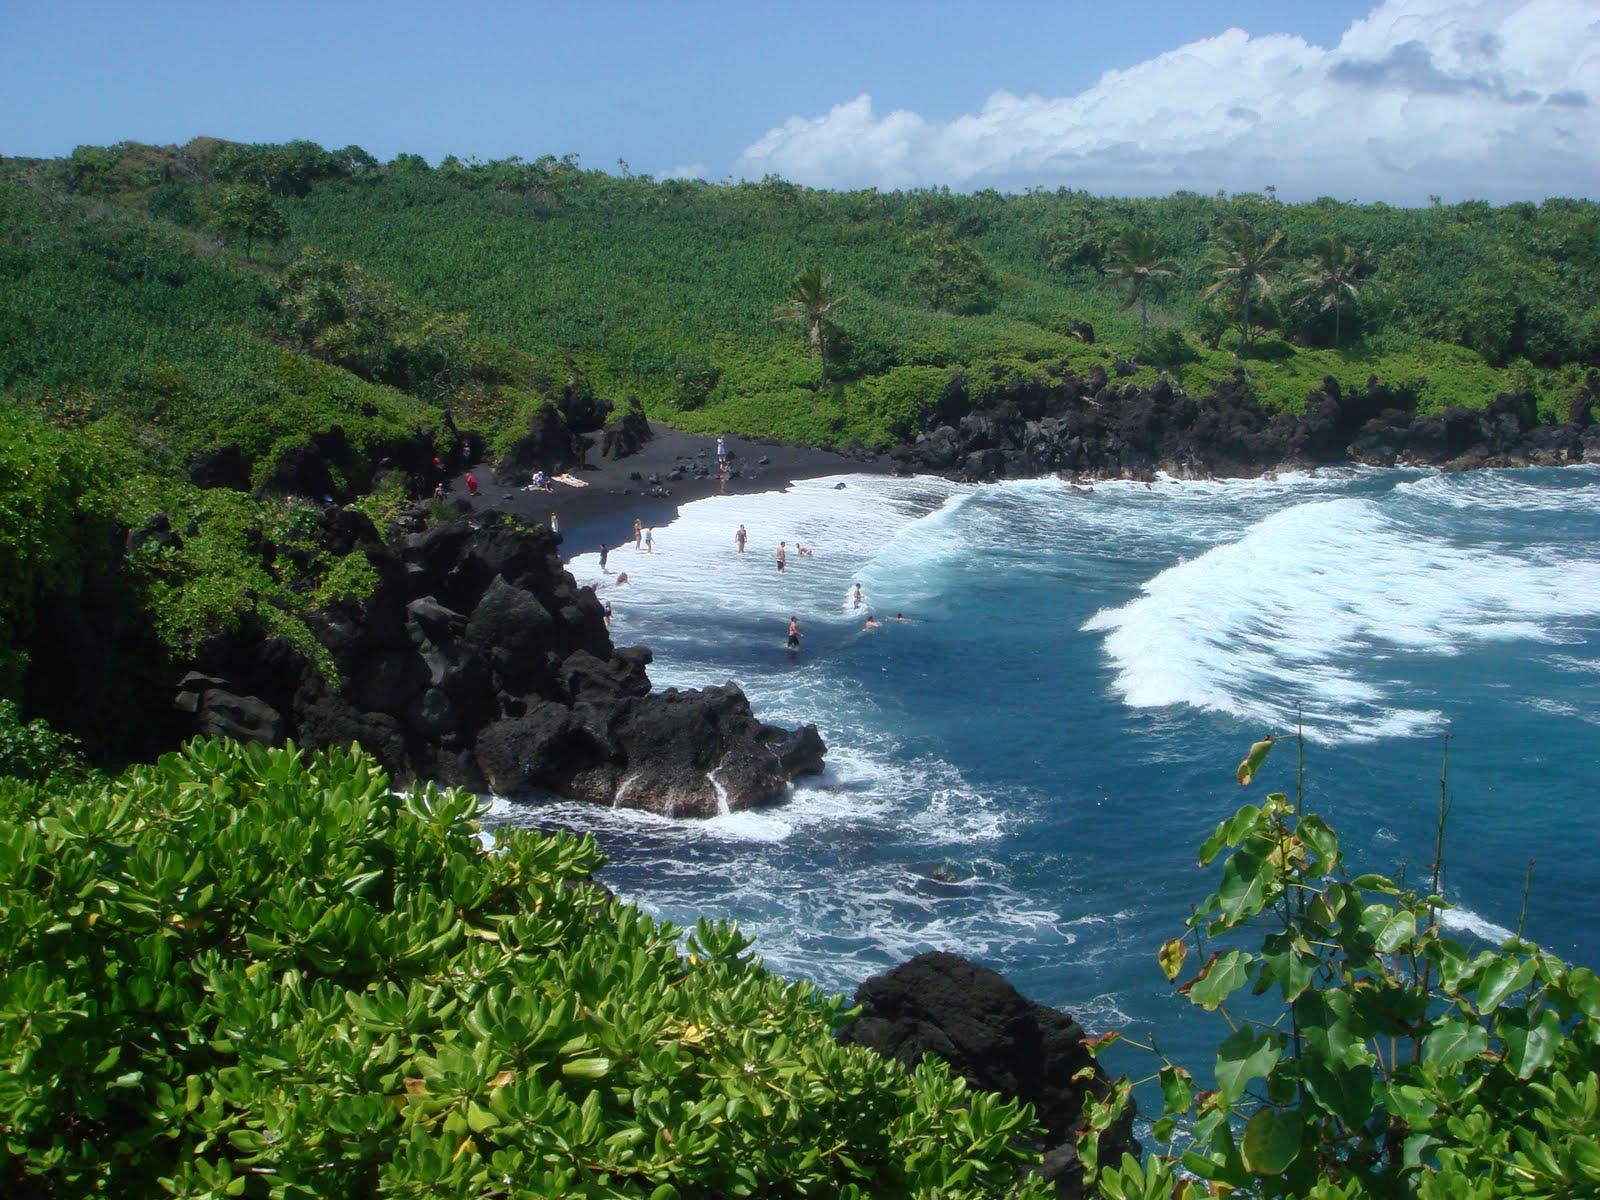 Uyilly\'s Travels: Maui, HI: 4/4/10 - 4/7/10